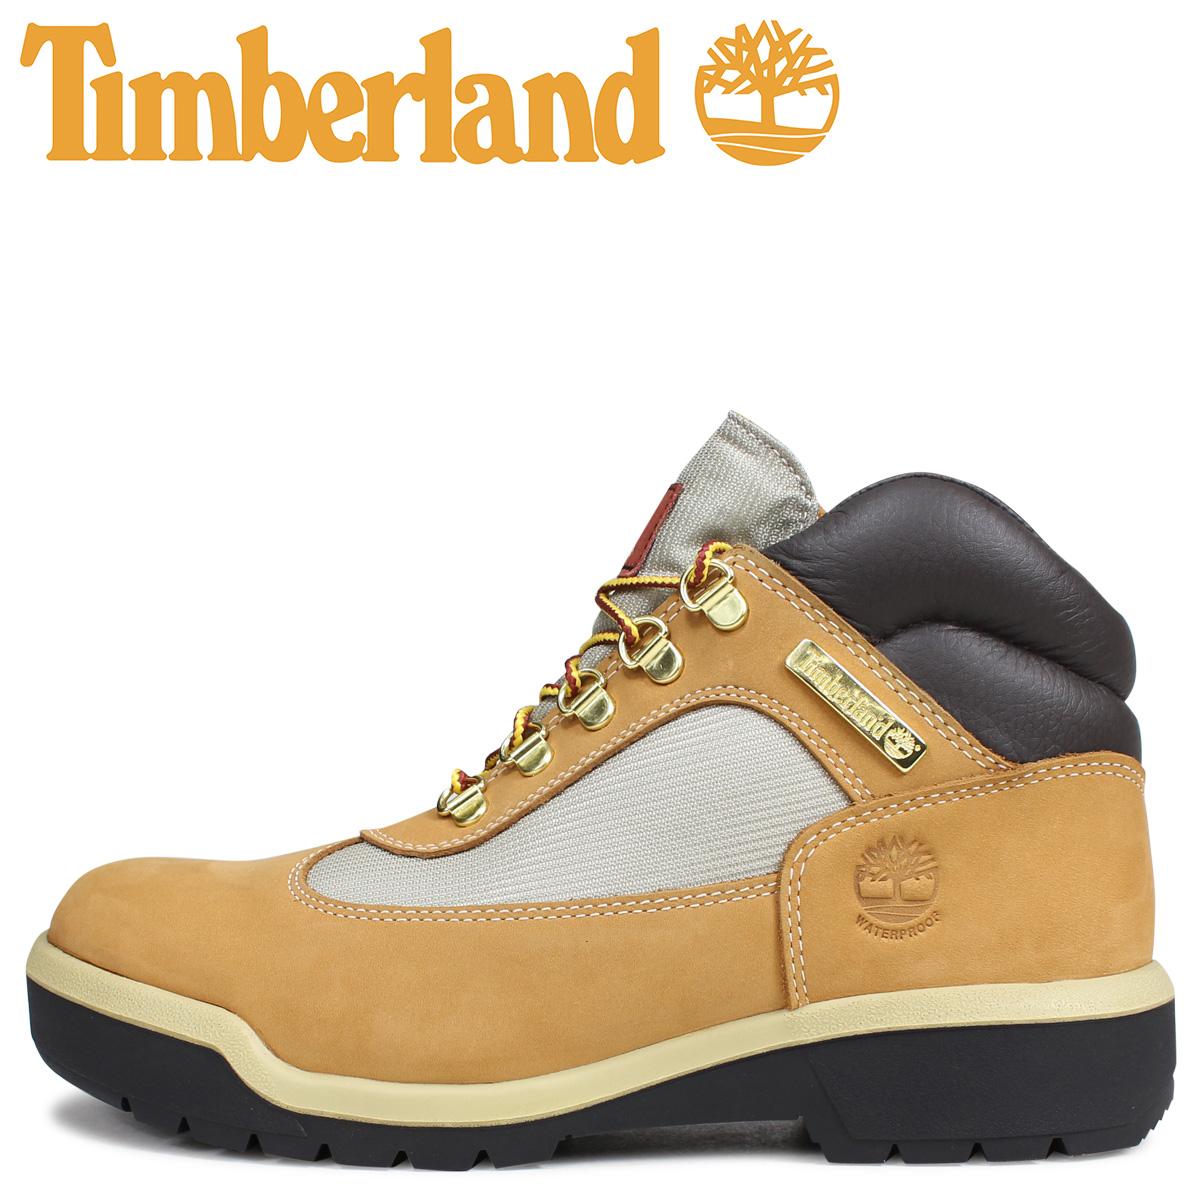 Timberland ティンバーランド フィールド ブーツ メンズ FIELD BOOT F/L WP 防水 ウィート ベージュ A18RI